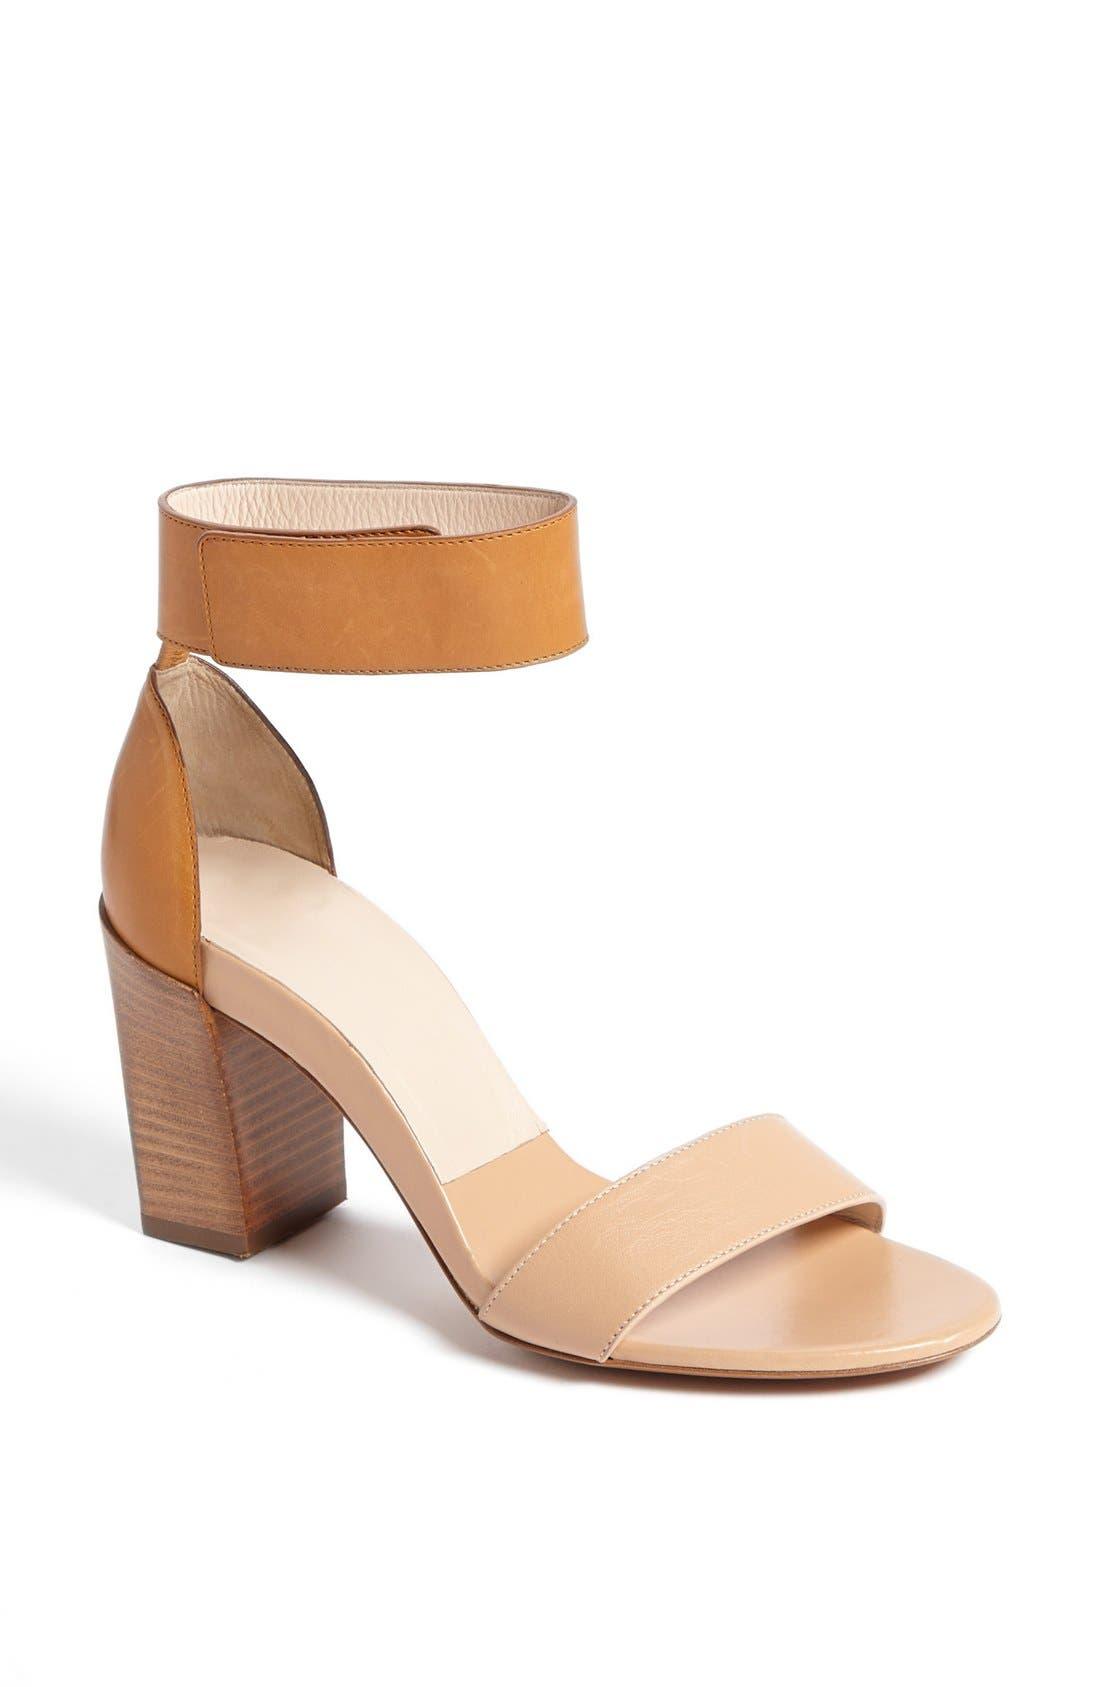 Alternate Image 1 Selected - Chloé 'Gala - Soft Apricot' Sandal